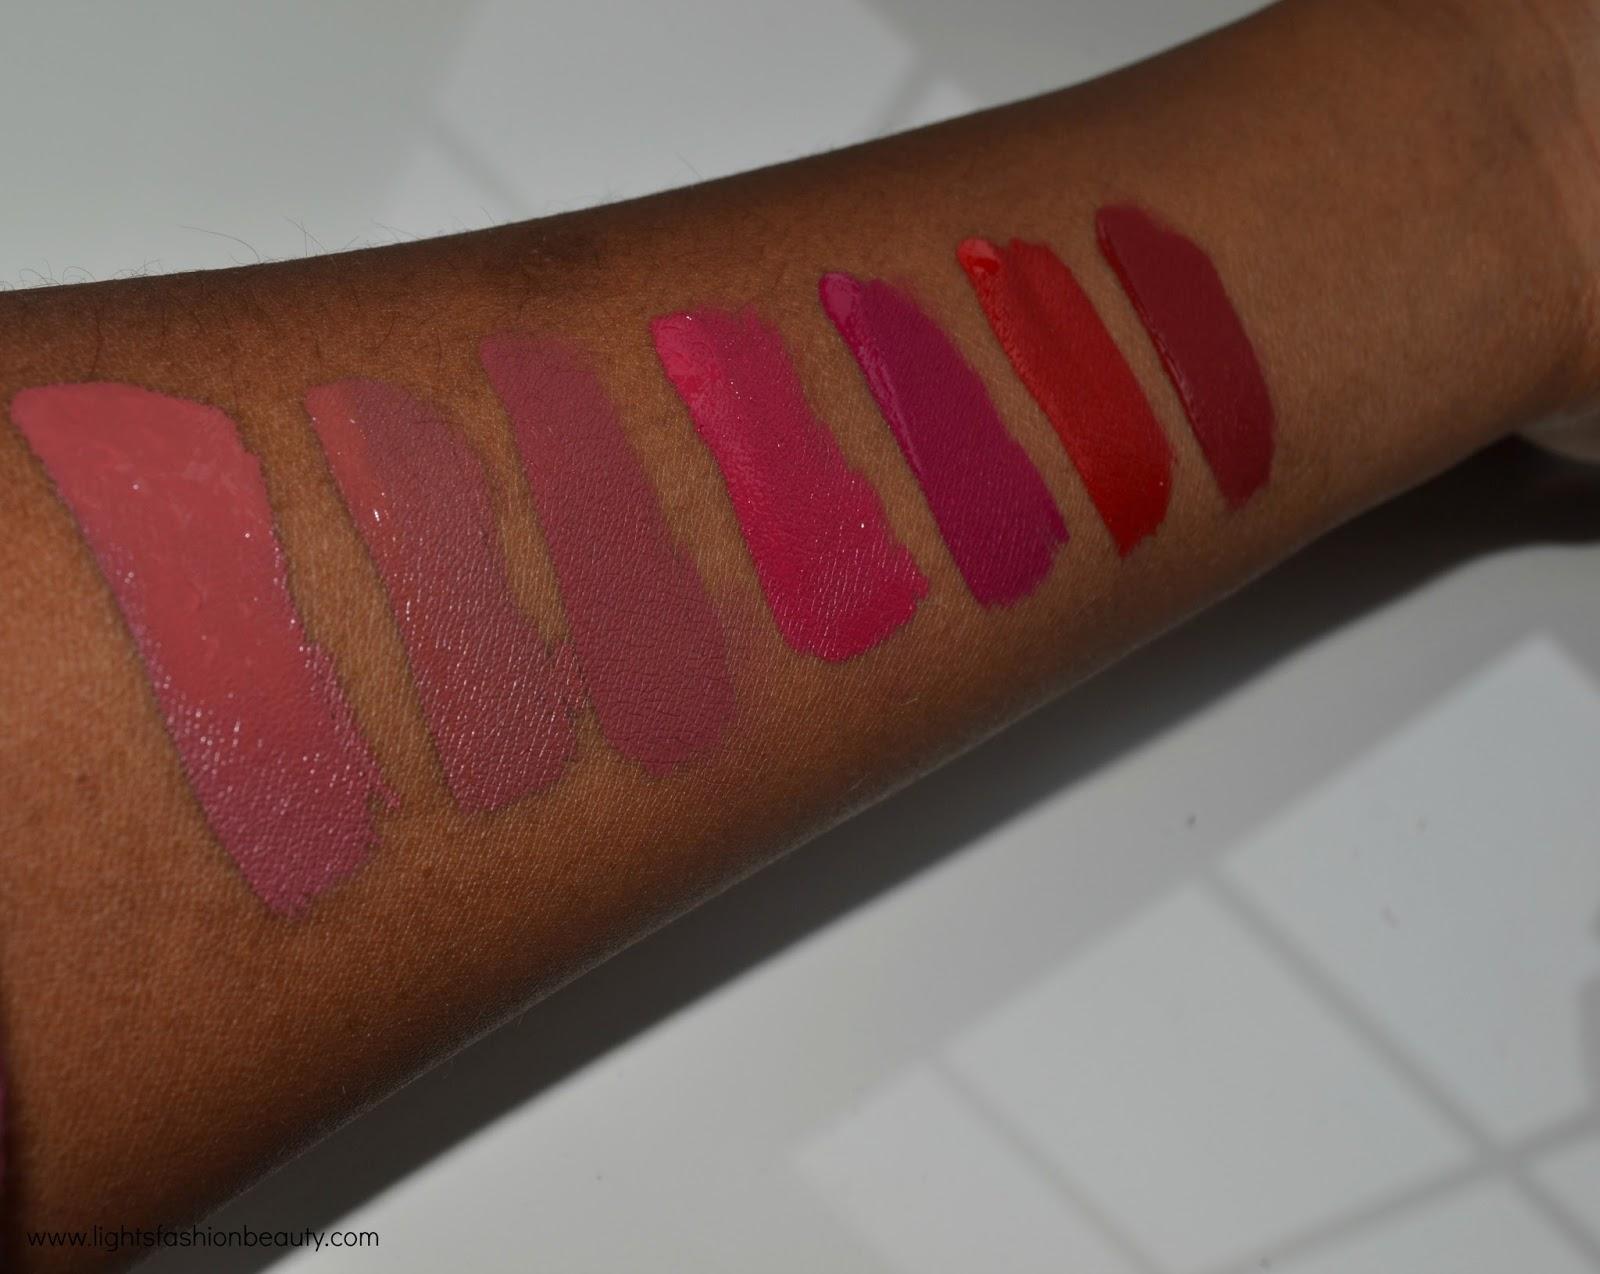 colourpop liquid lipsticks, colourpop ultra matte lip swatches on dark skin, colourpop liquid lipstick on dark skin, brown beauty blogger, drugstore liquid lipstick